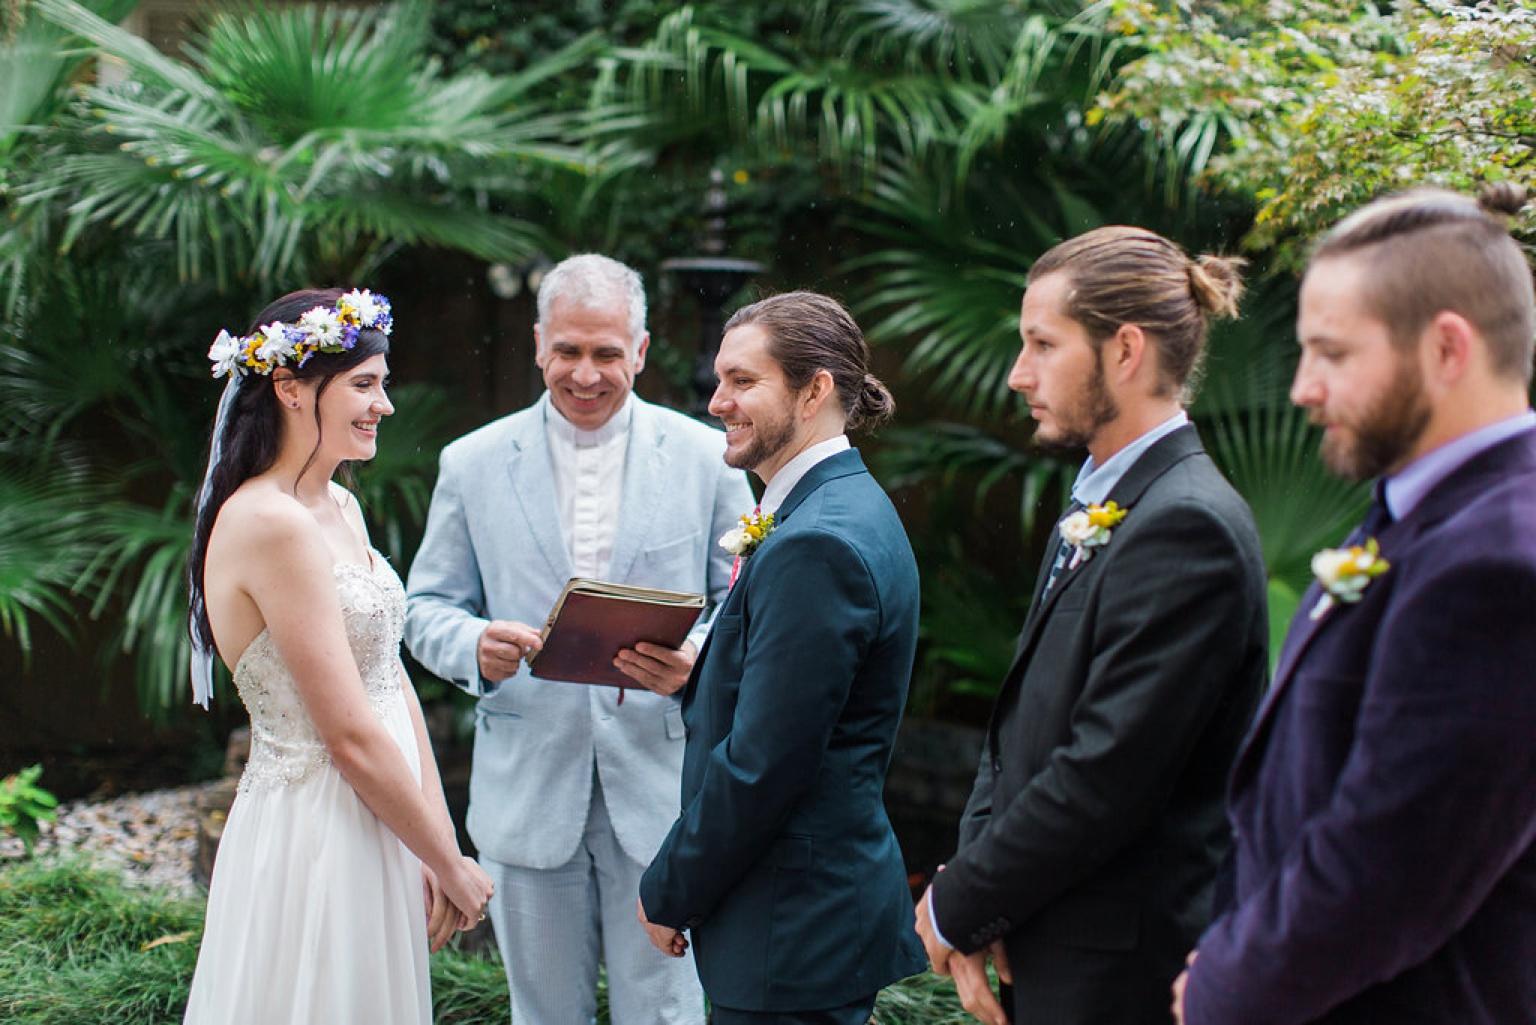 Apt_B_Photo_Savannah_Wedding_Photographer_Flower_Crown027.JPG